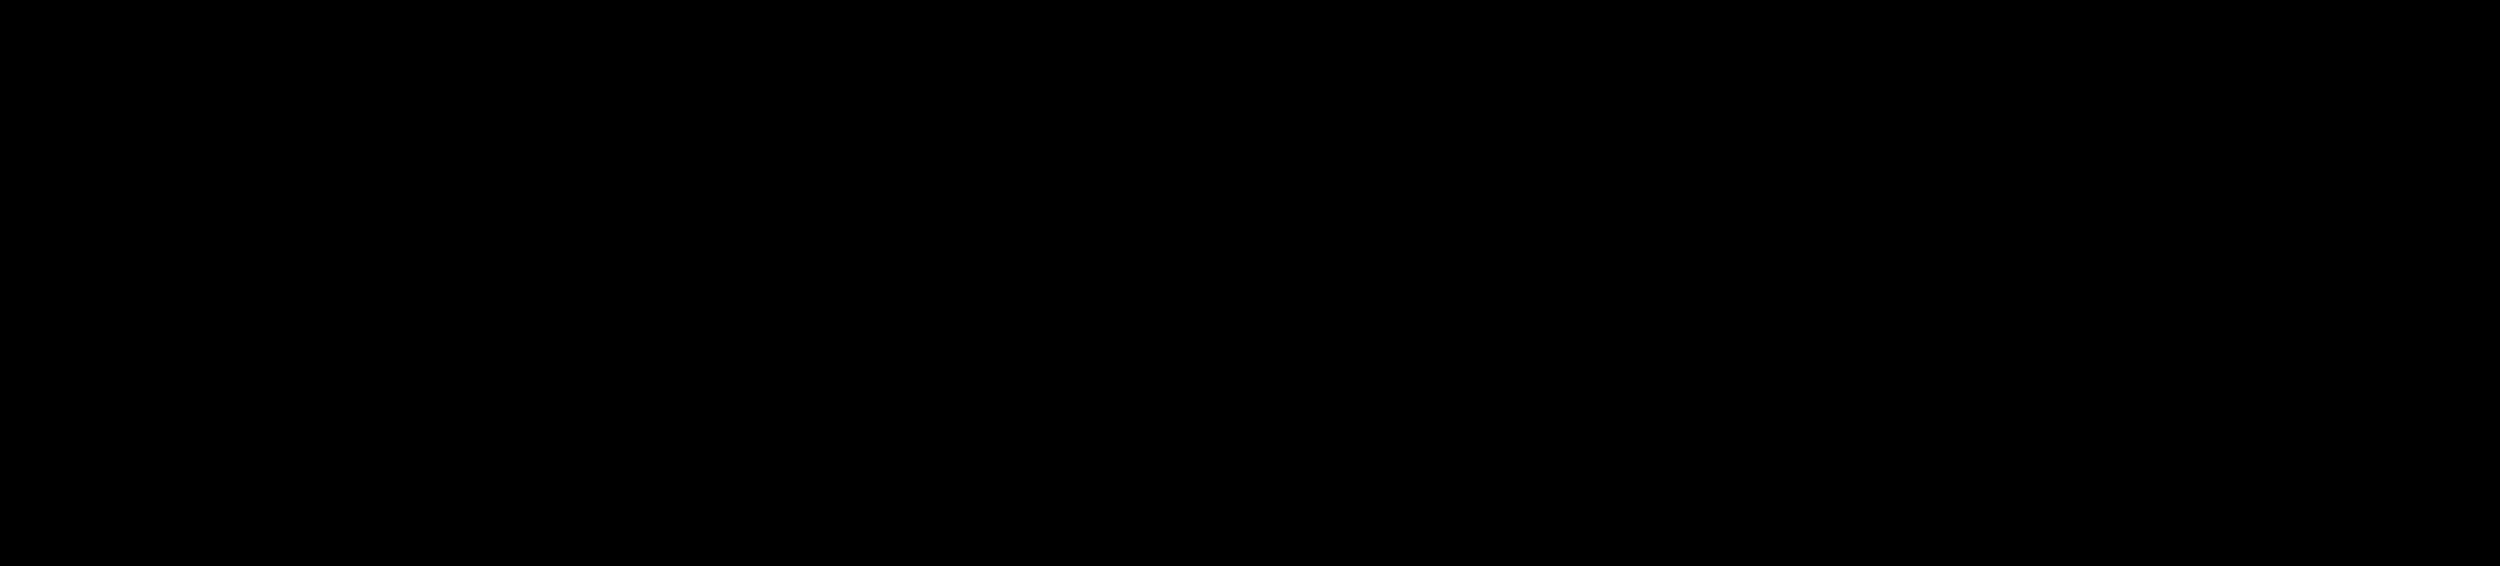 YAMAHA_logomark_2010_BLACK.png